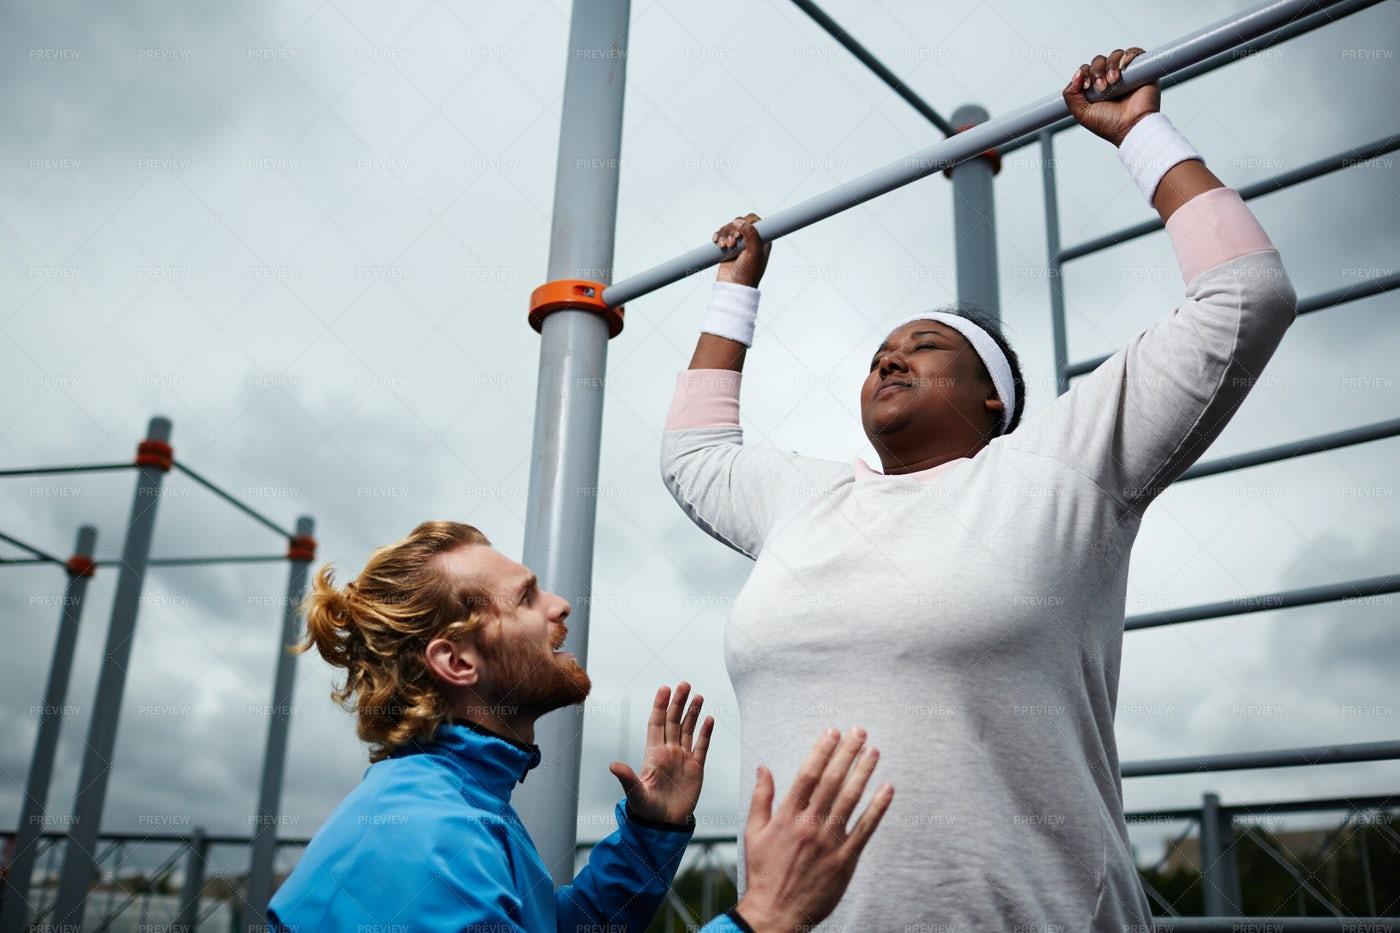 Exercising On Bars: Stock Photos